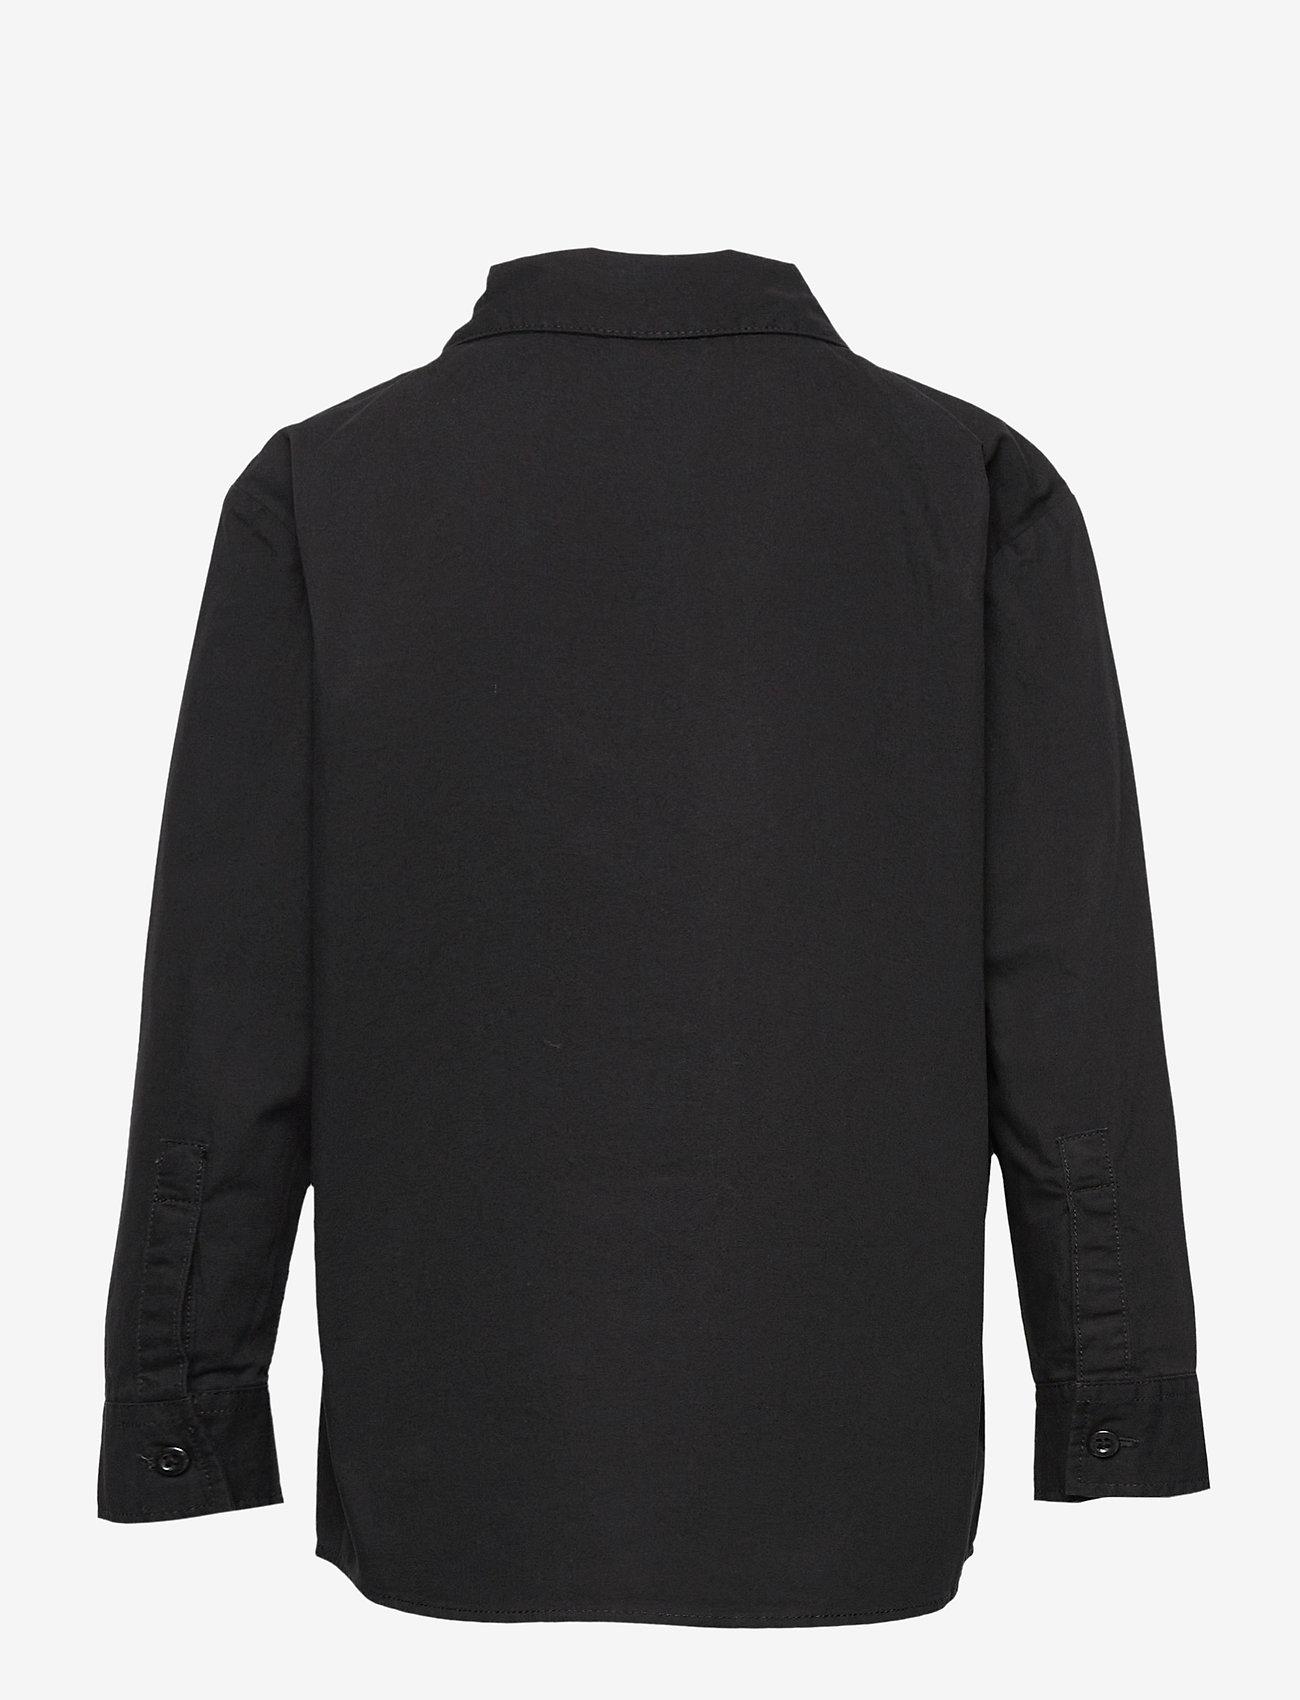 Lindex - Shirt overshirt worker - shirts - black - 1